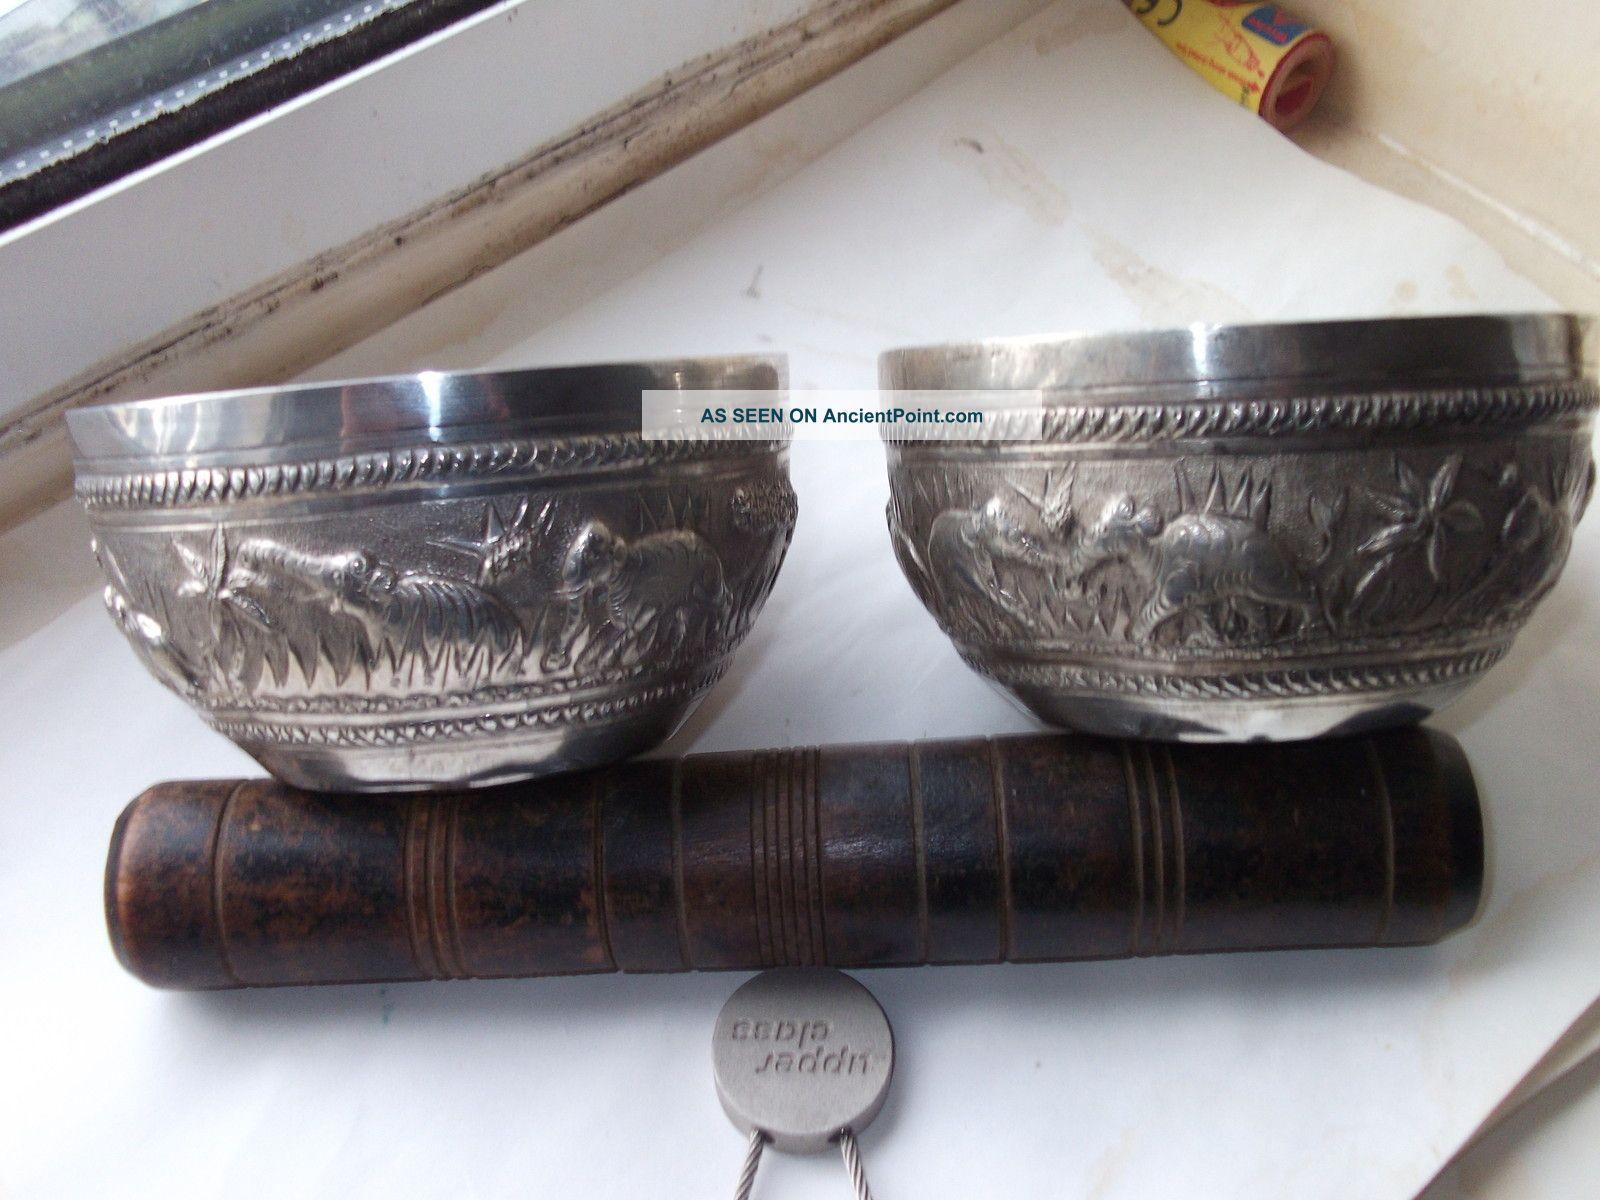 Fine 19c Pair Of Silver Repousse India Burmese 4 Inch Bowls Elephant Designs Bowls photo